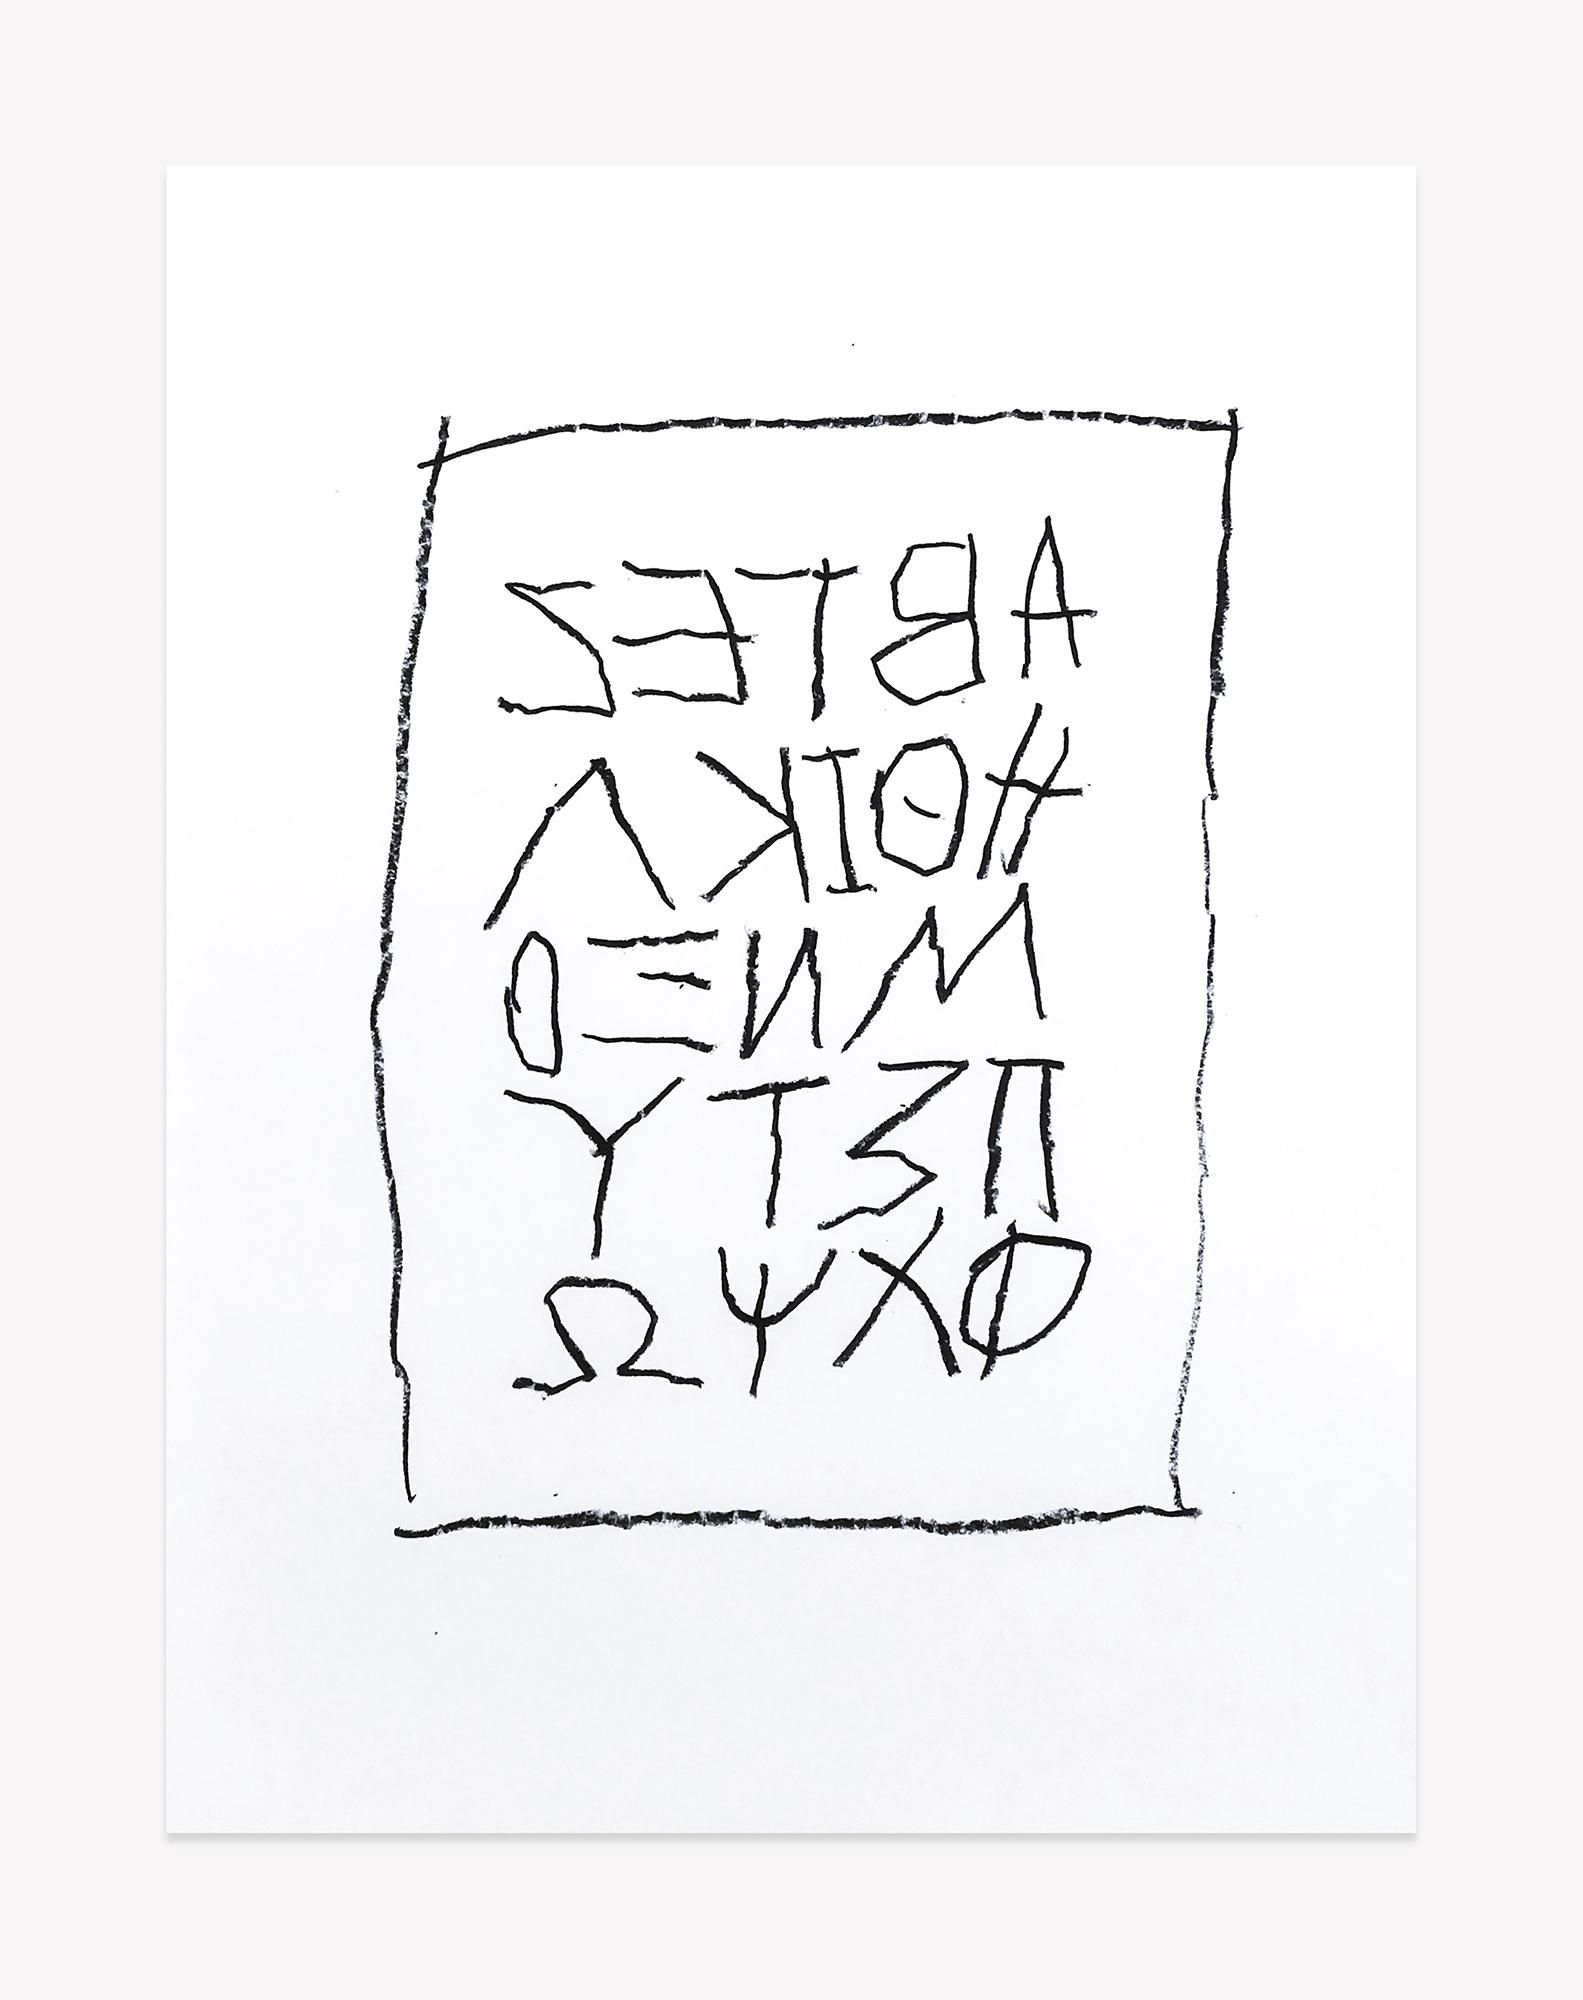 Al Freeman  Alphabet 1  2018 Oil stick on paper 24 x 18 inches